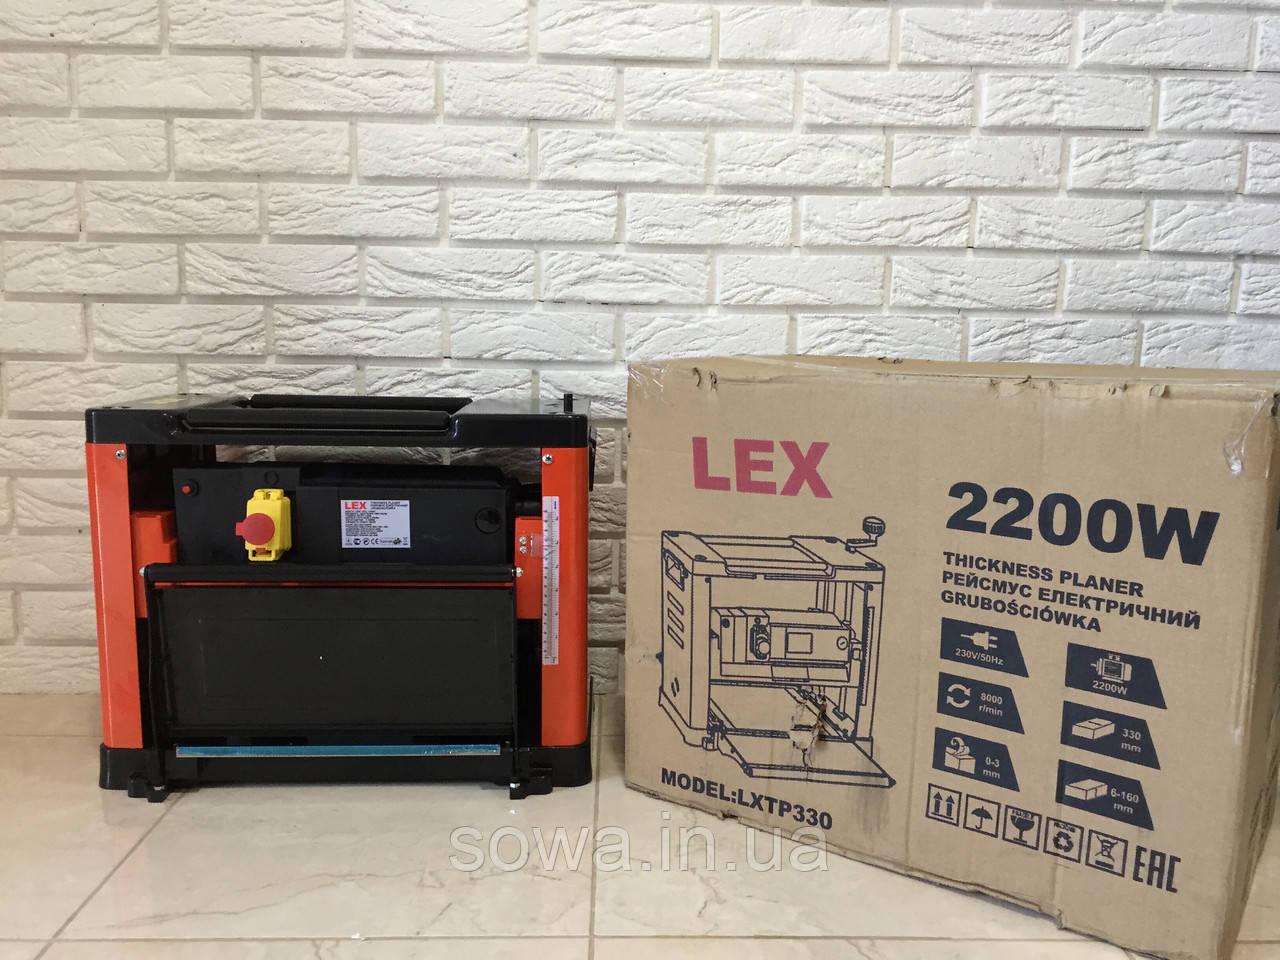 ✔️ Рейсмусовий верстат по дереву Lex LXTP330 / 2200Вт